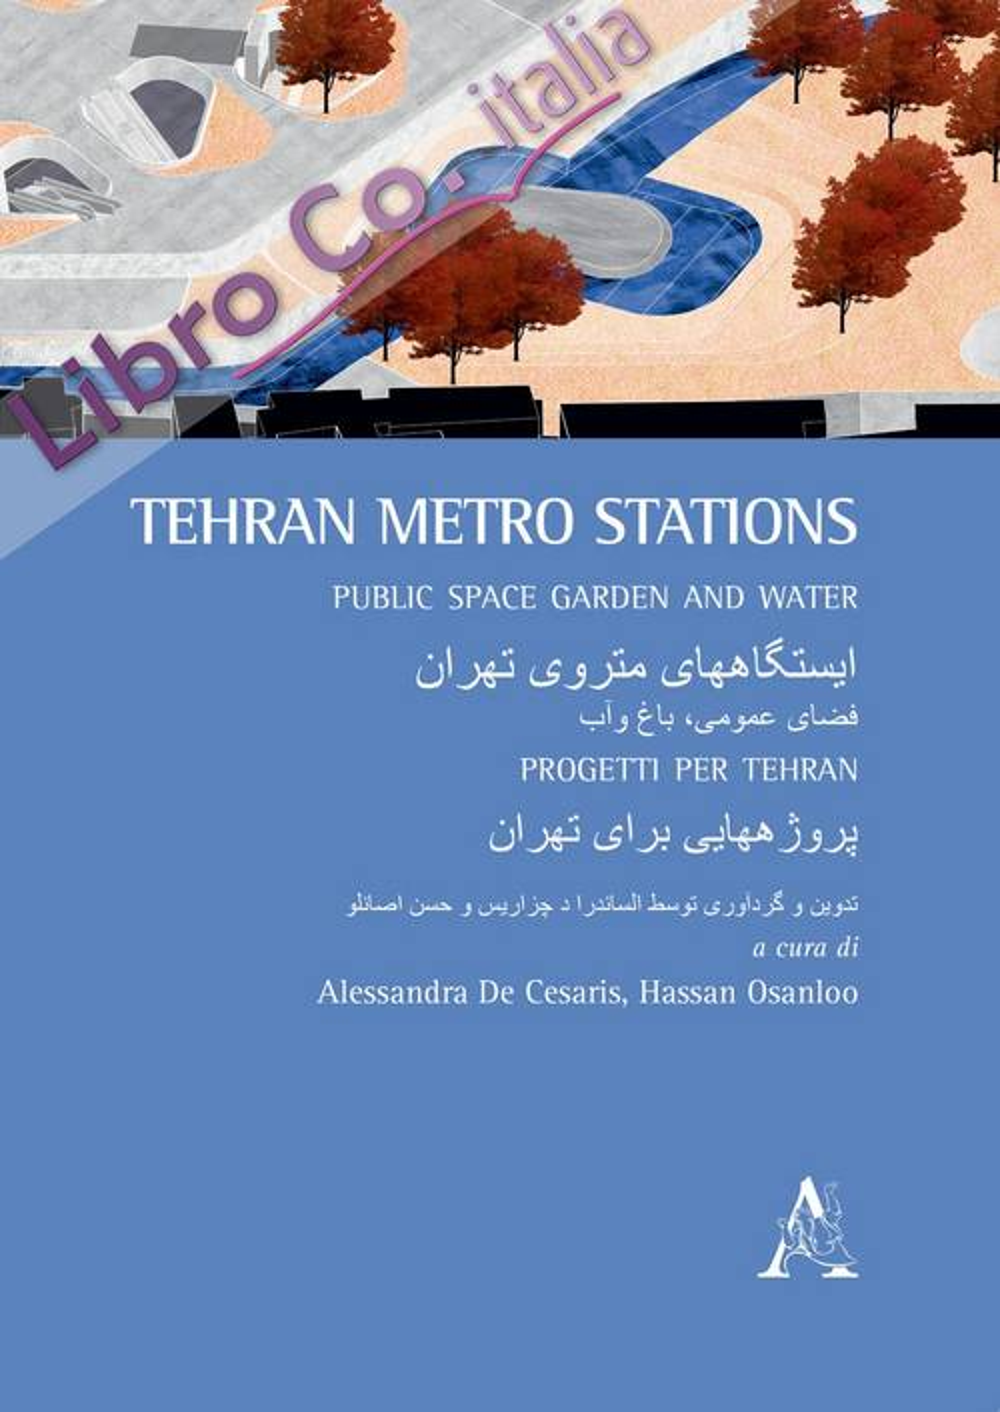 Teheran Metro Stations. Public space, garden and water. Ediz. inglese e iraniano